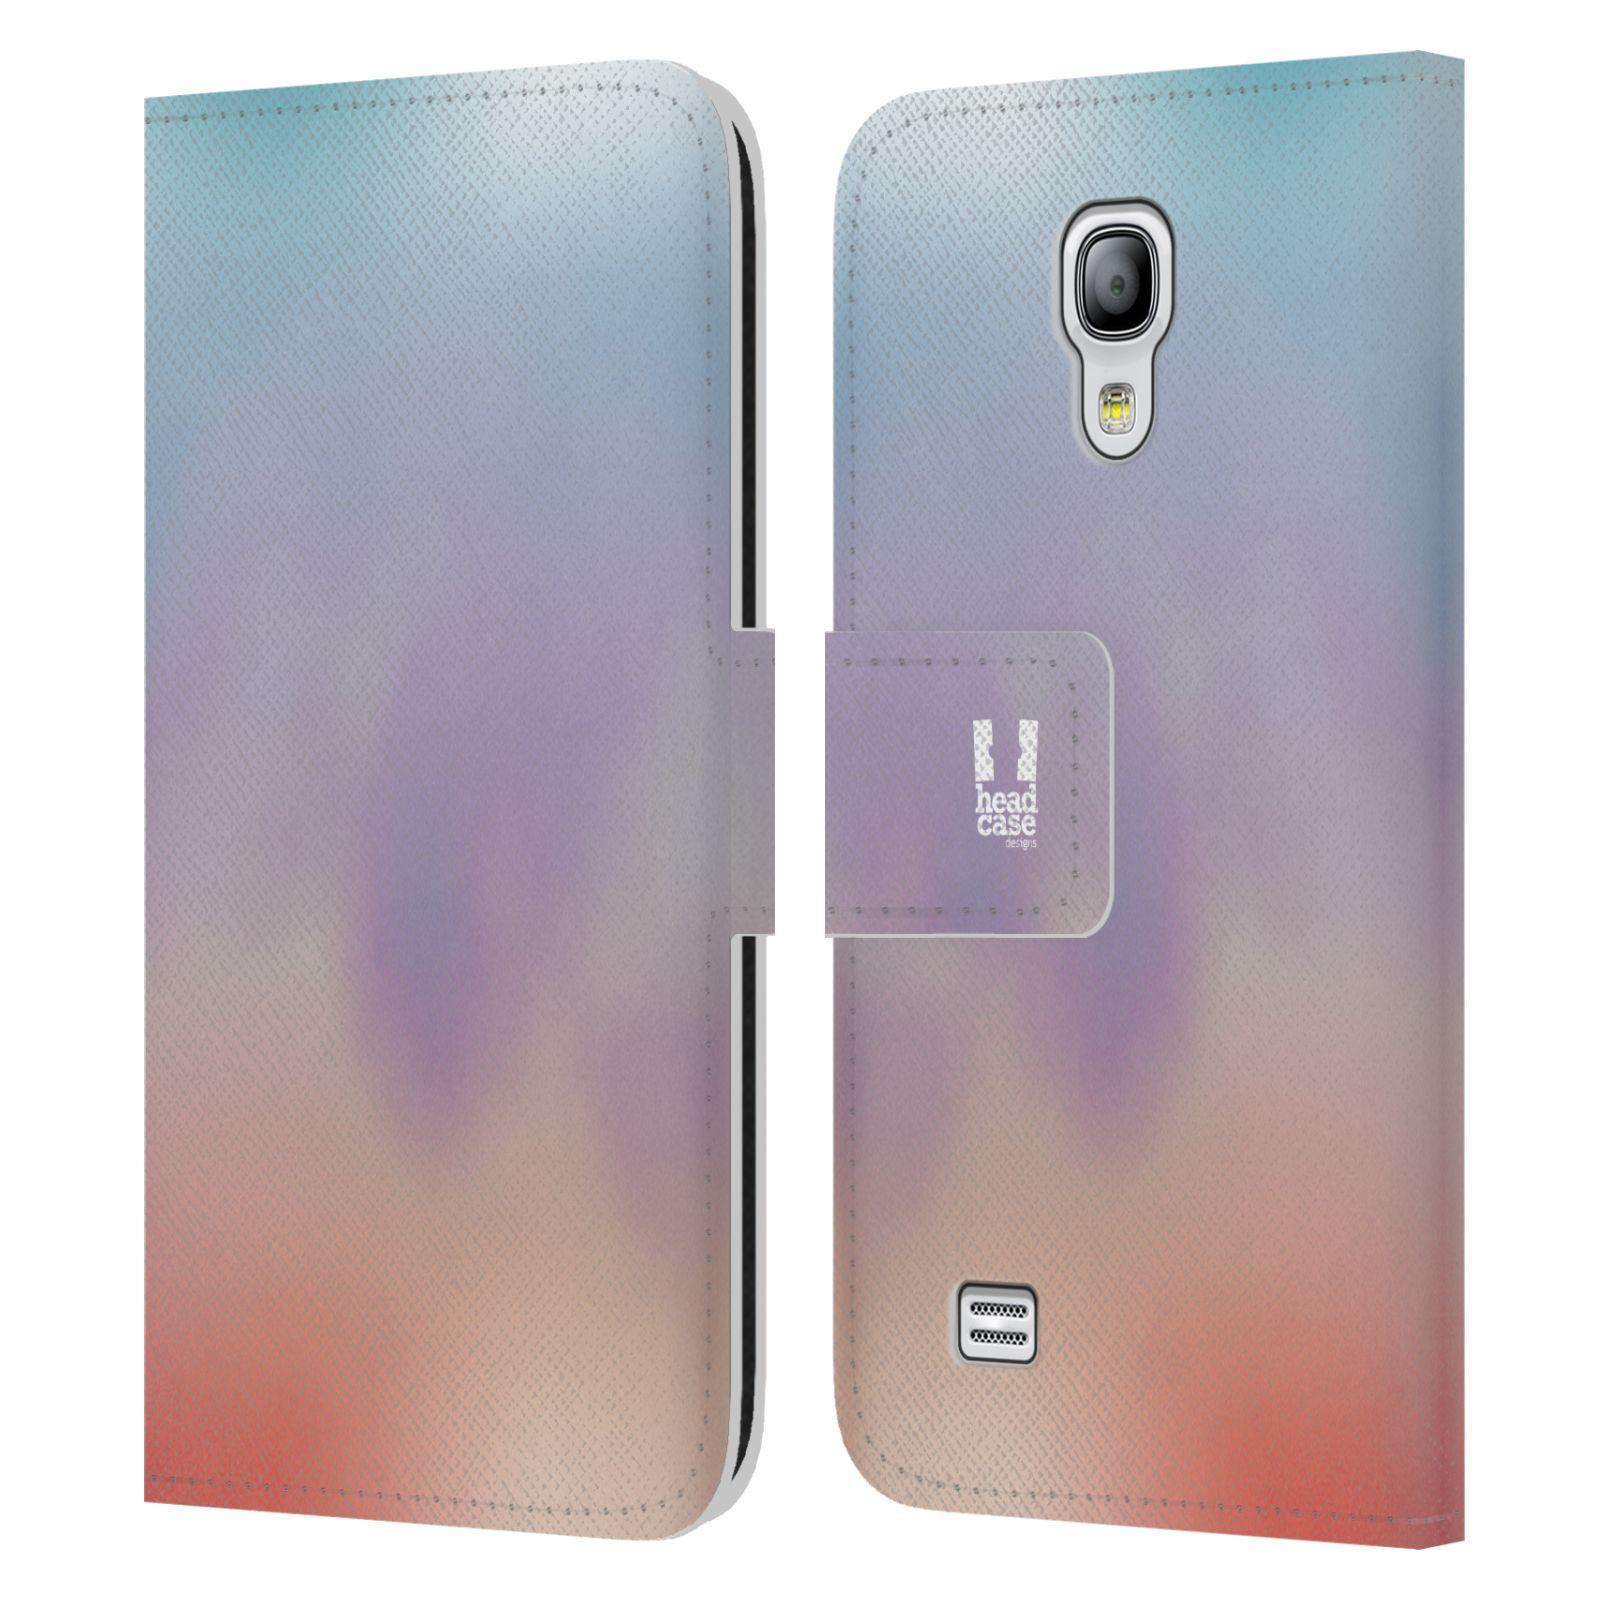 HEAD CASE Flipové pouzdro pro mobil Samsung Galaxy S4 MINI / S4 MINI DUOS AQUAREL barvy LIGHT